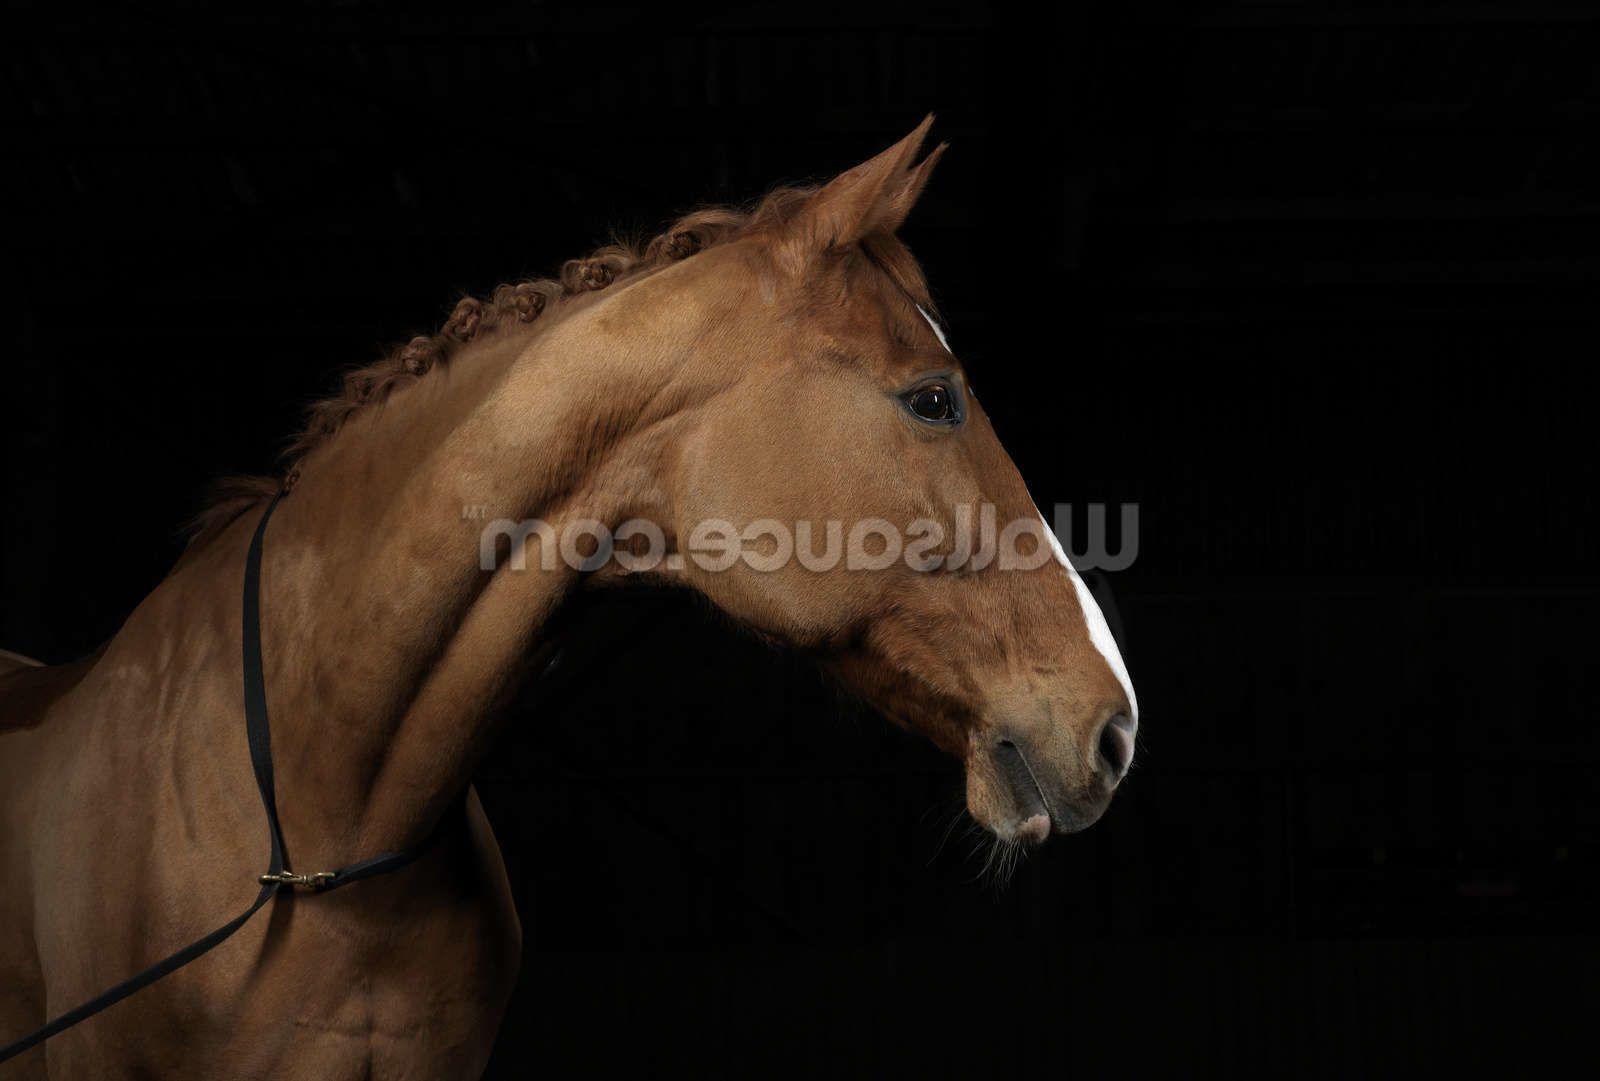 Handsome Horse Horse mural, Horse wallpaper, Horses